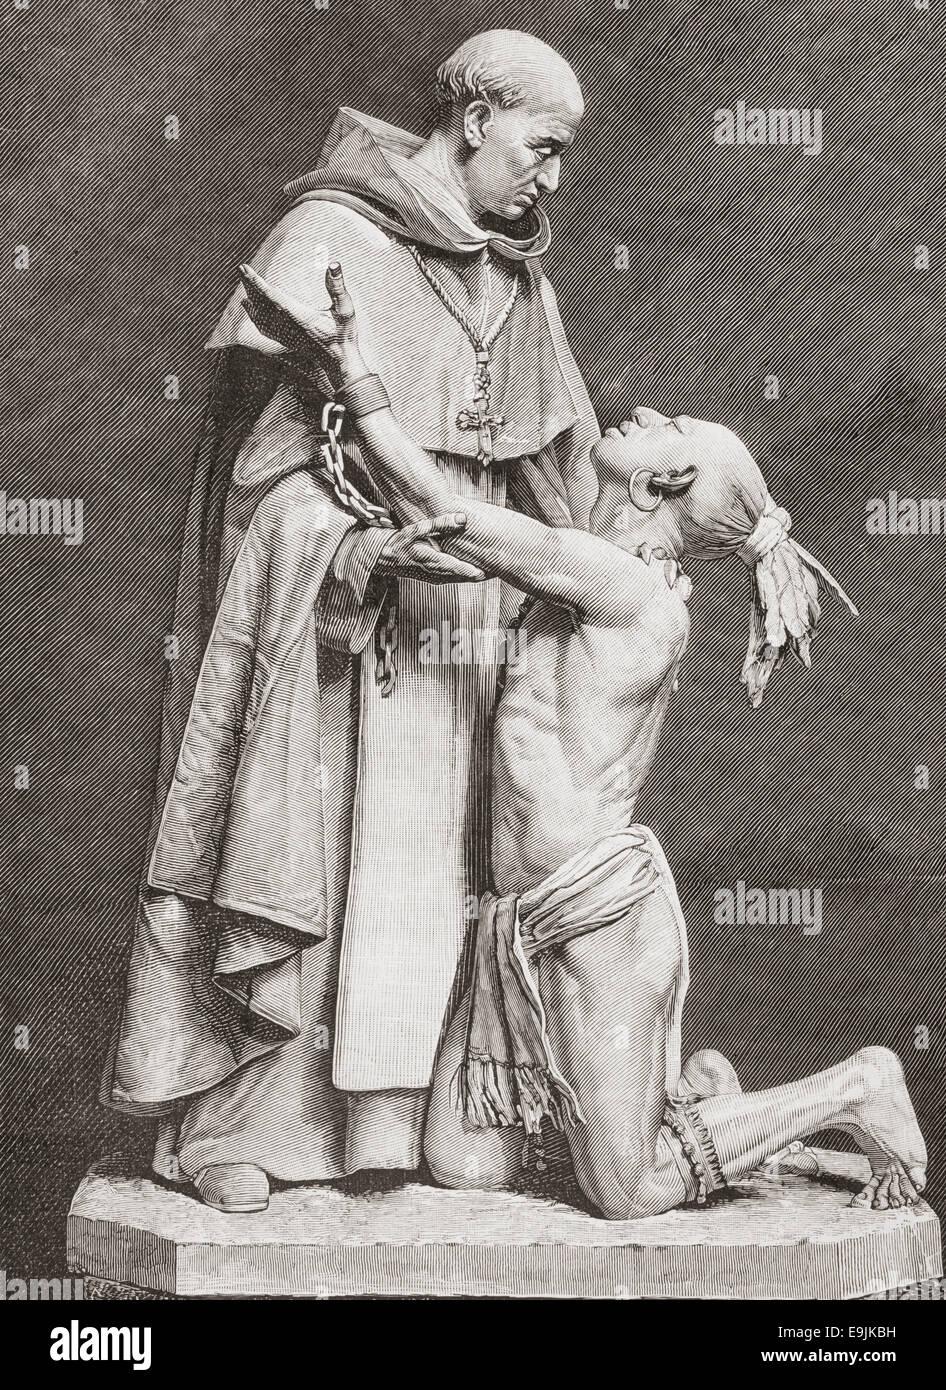 Bartolomé de las Casas, c. 1484 - 1566.  16th-century Spanish historian, social reformer and Dominican friar. - Stock Image